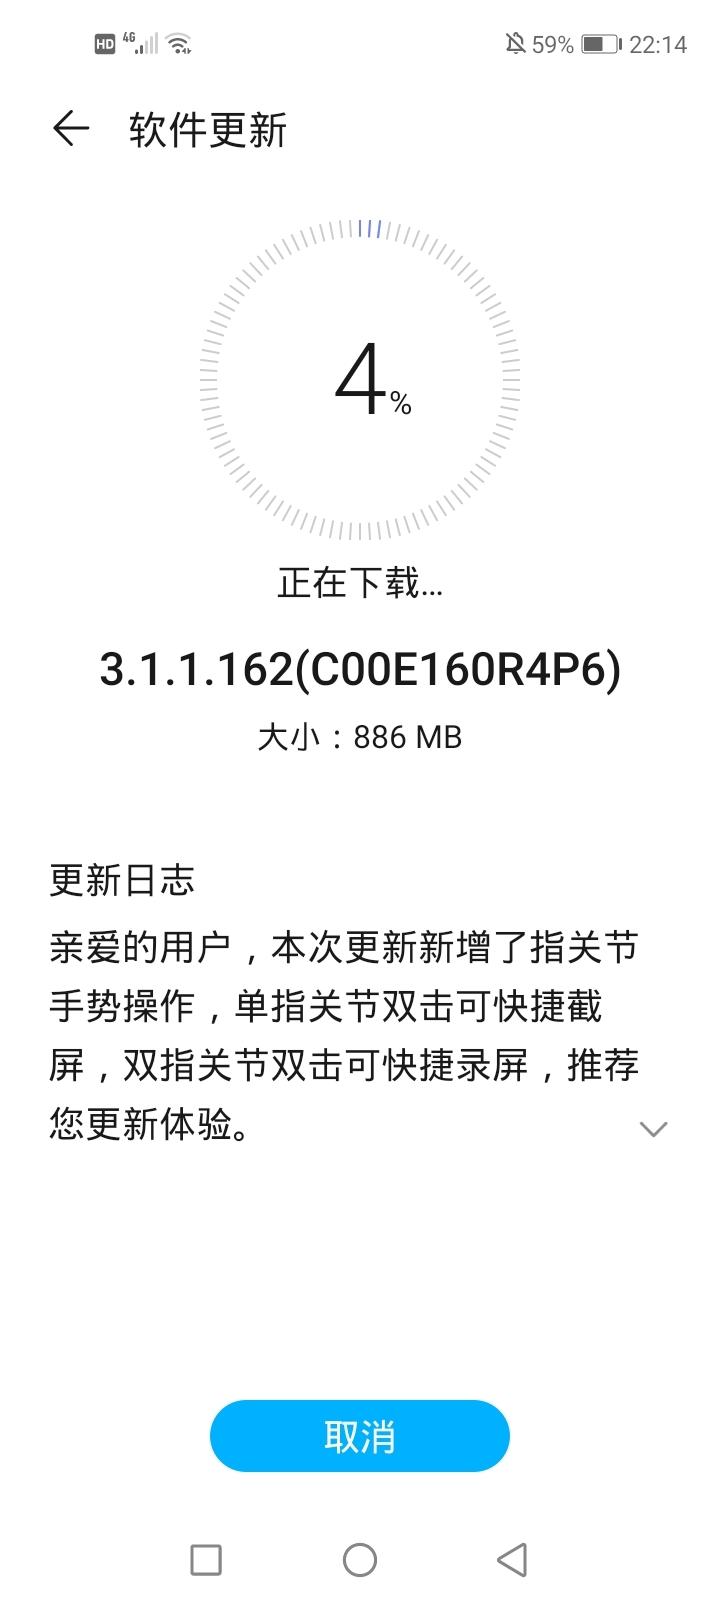 Screenshot_20200707_221419_com.huawei.android.hwouc.jpg